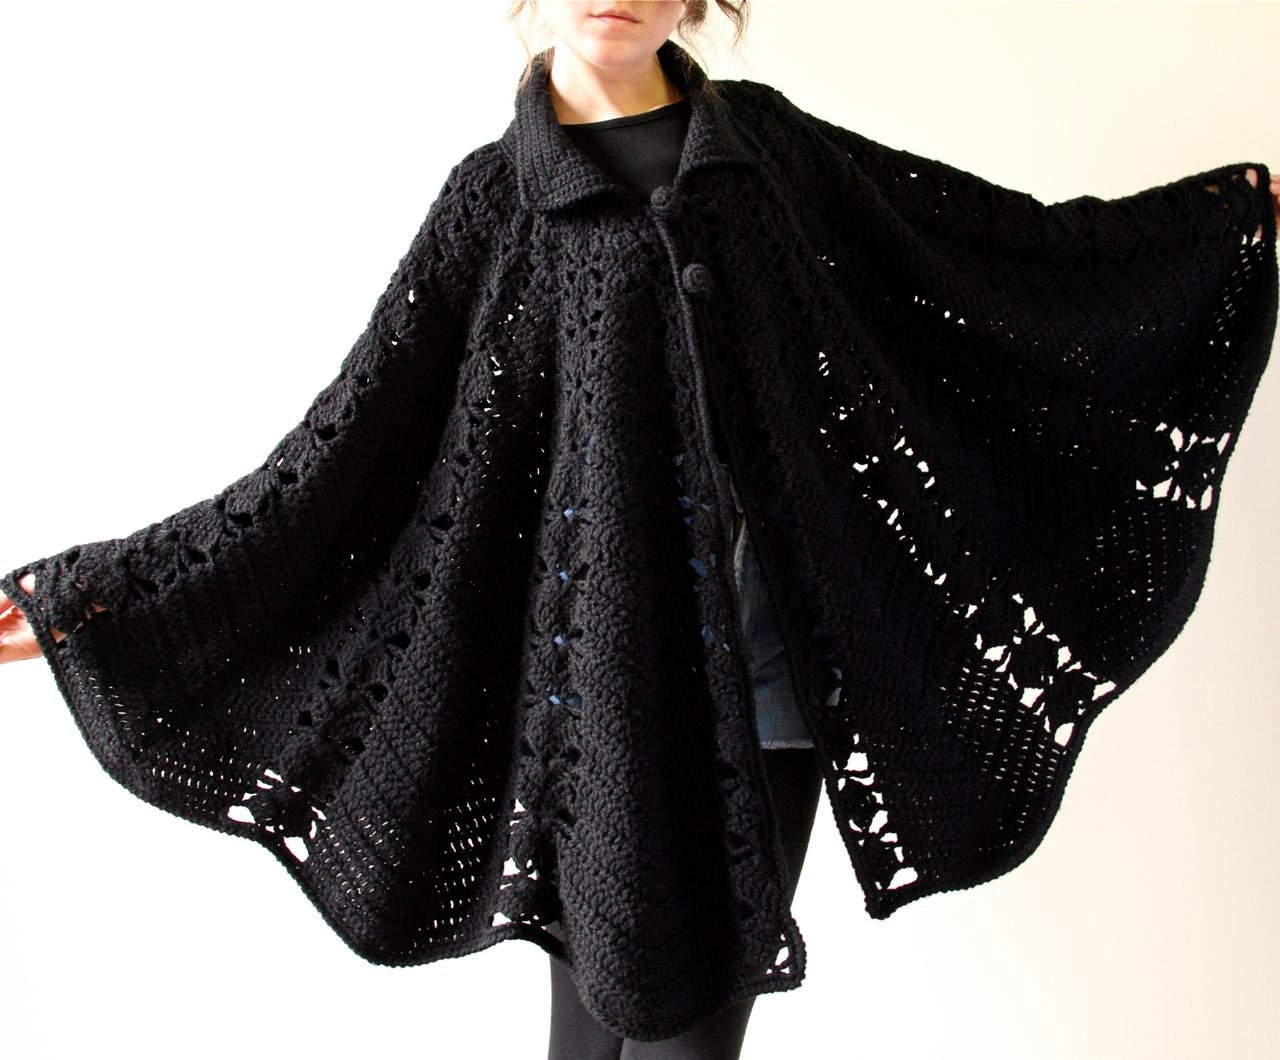 60s Mod Crochet Cape Black Minimalist Boho By Factoryhandbook